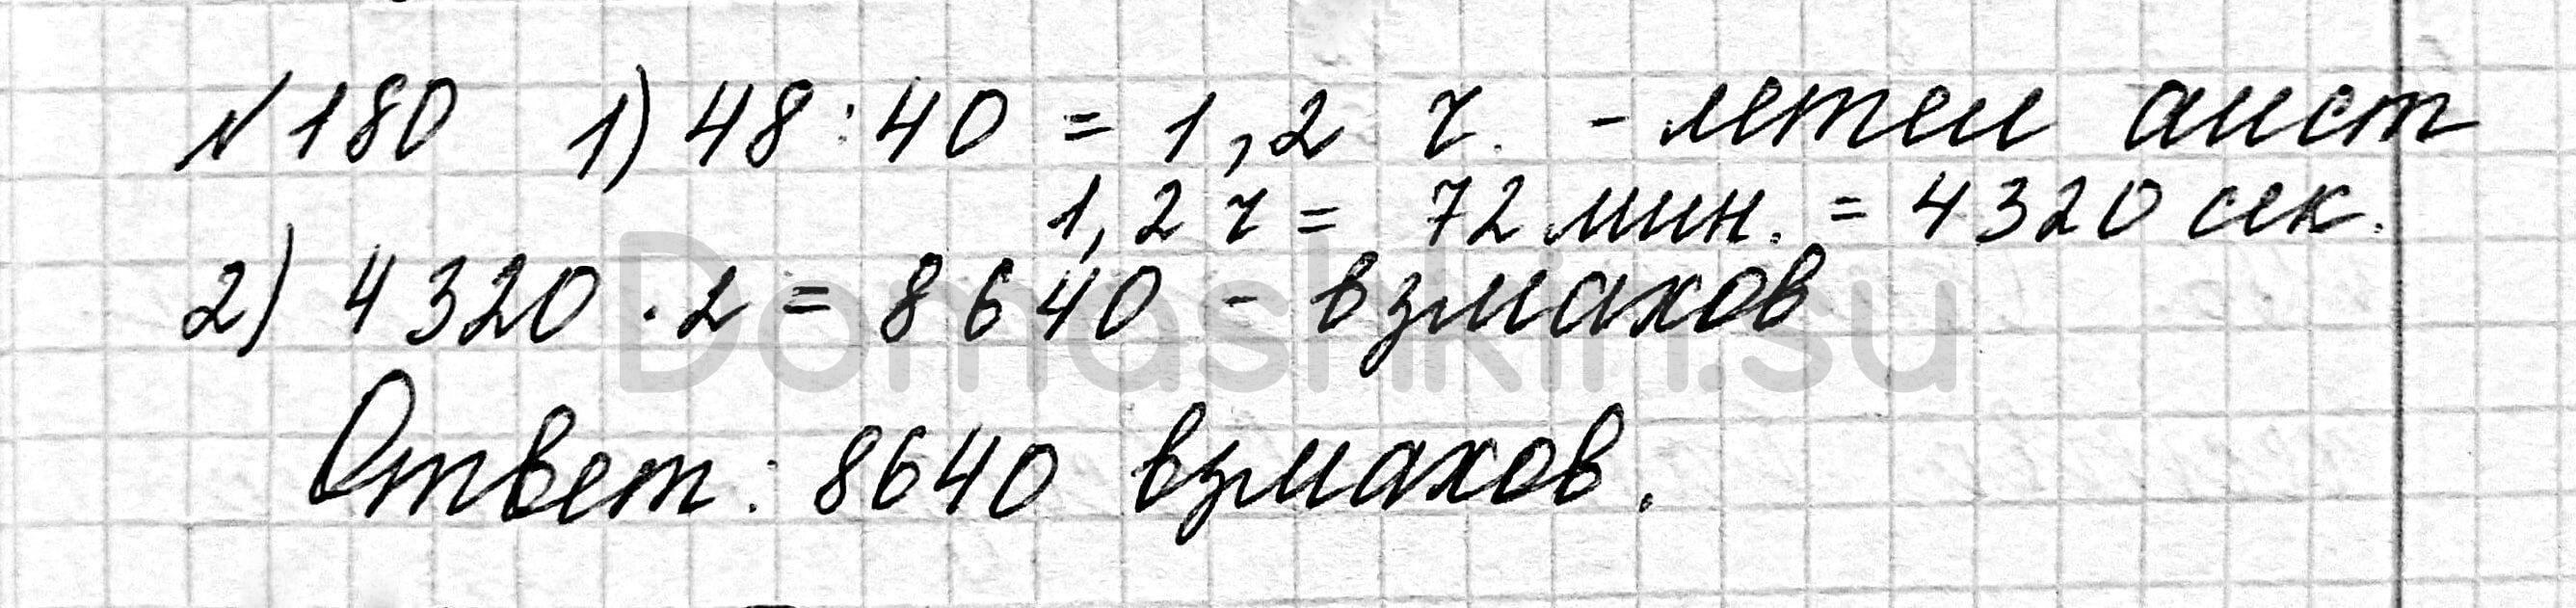 Математика 6 класс учебник Мерзляк номер 180 решение